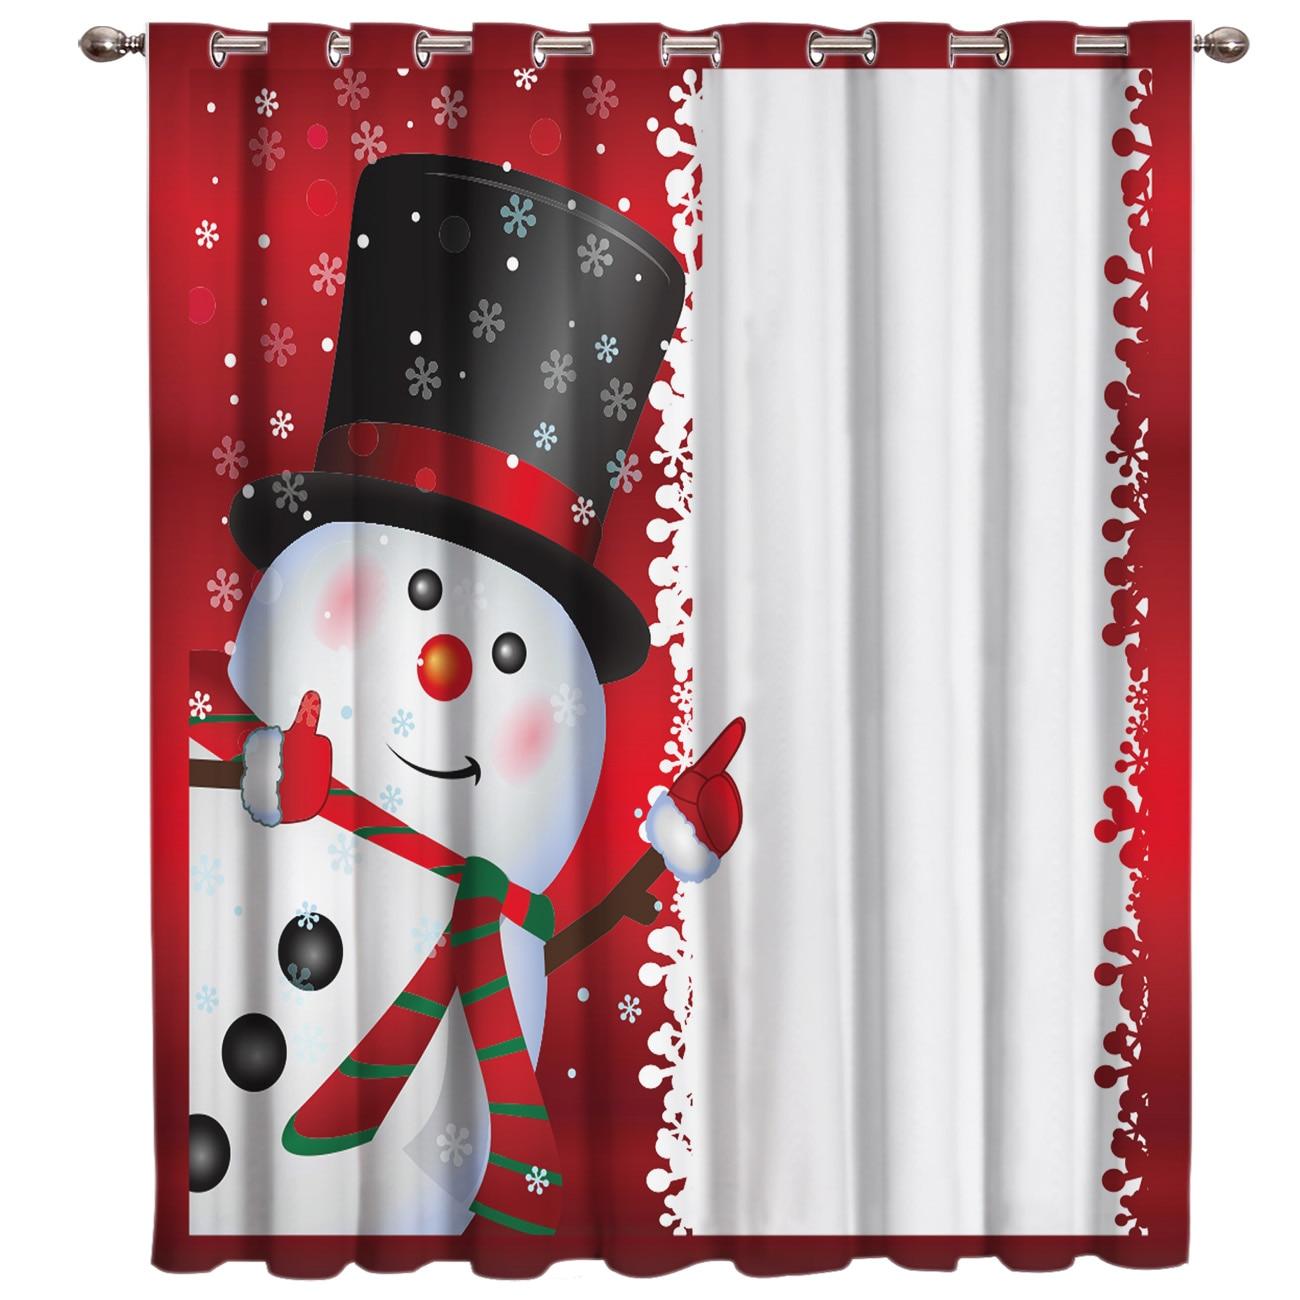 Merry Christmas Snowman Window Treatments Curtains Valance Room Curtains Large Window Window Curtains Dark Curtain Rod Blackout